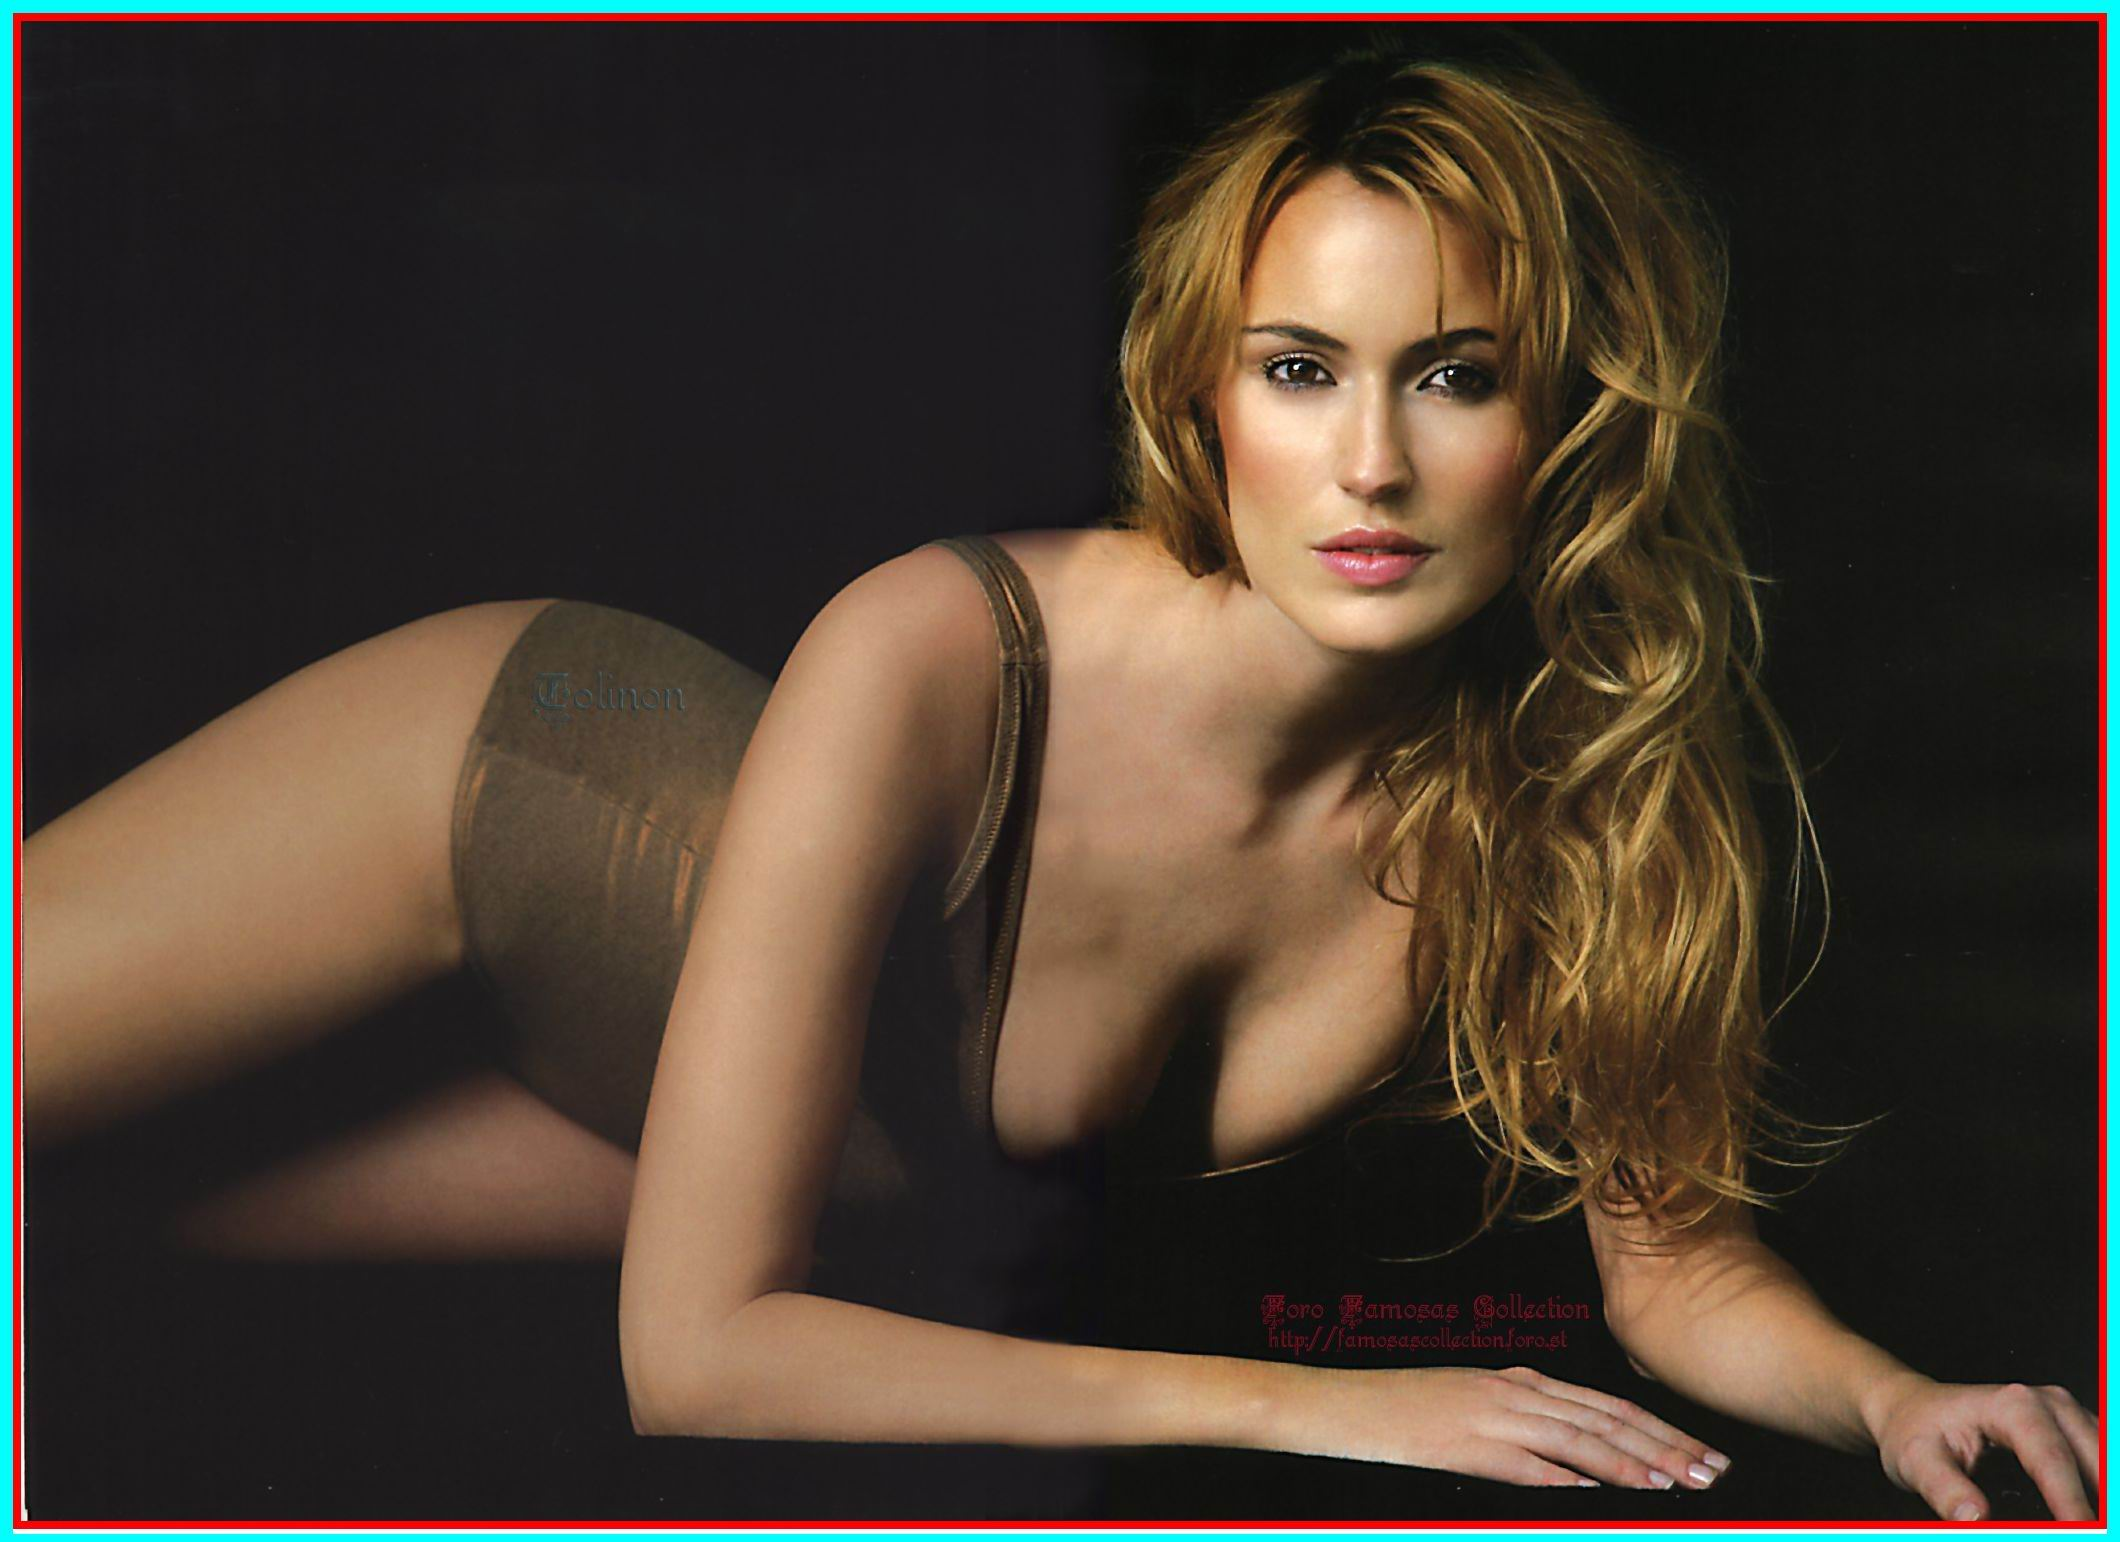 Carolina Cerezuela sexual 1